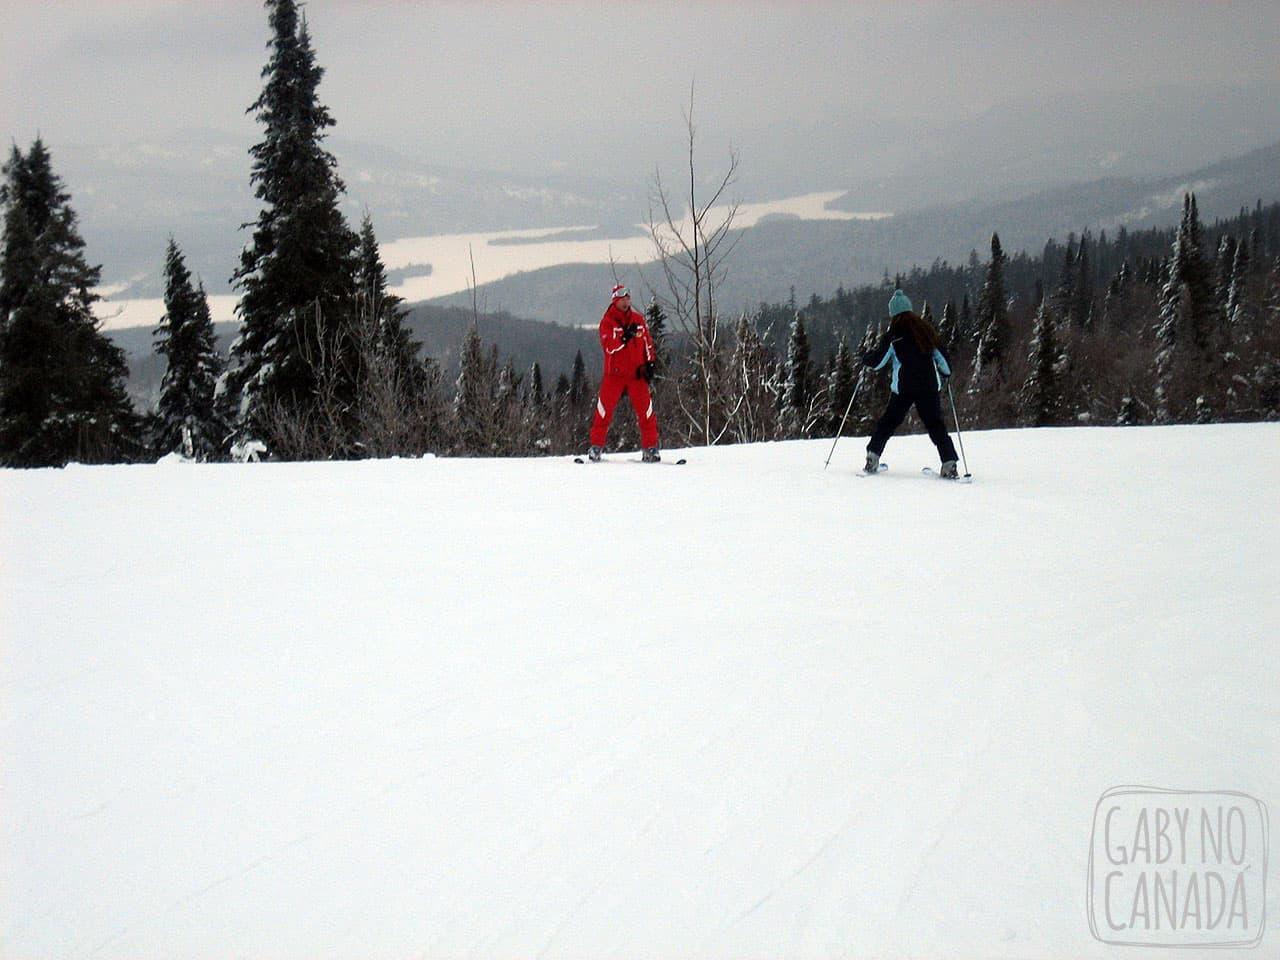 Casamento-+-Canada1-201